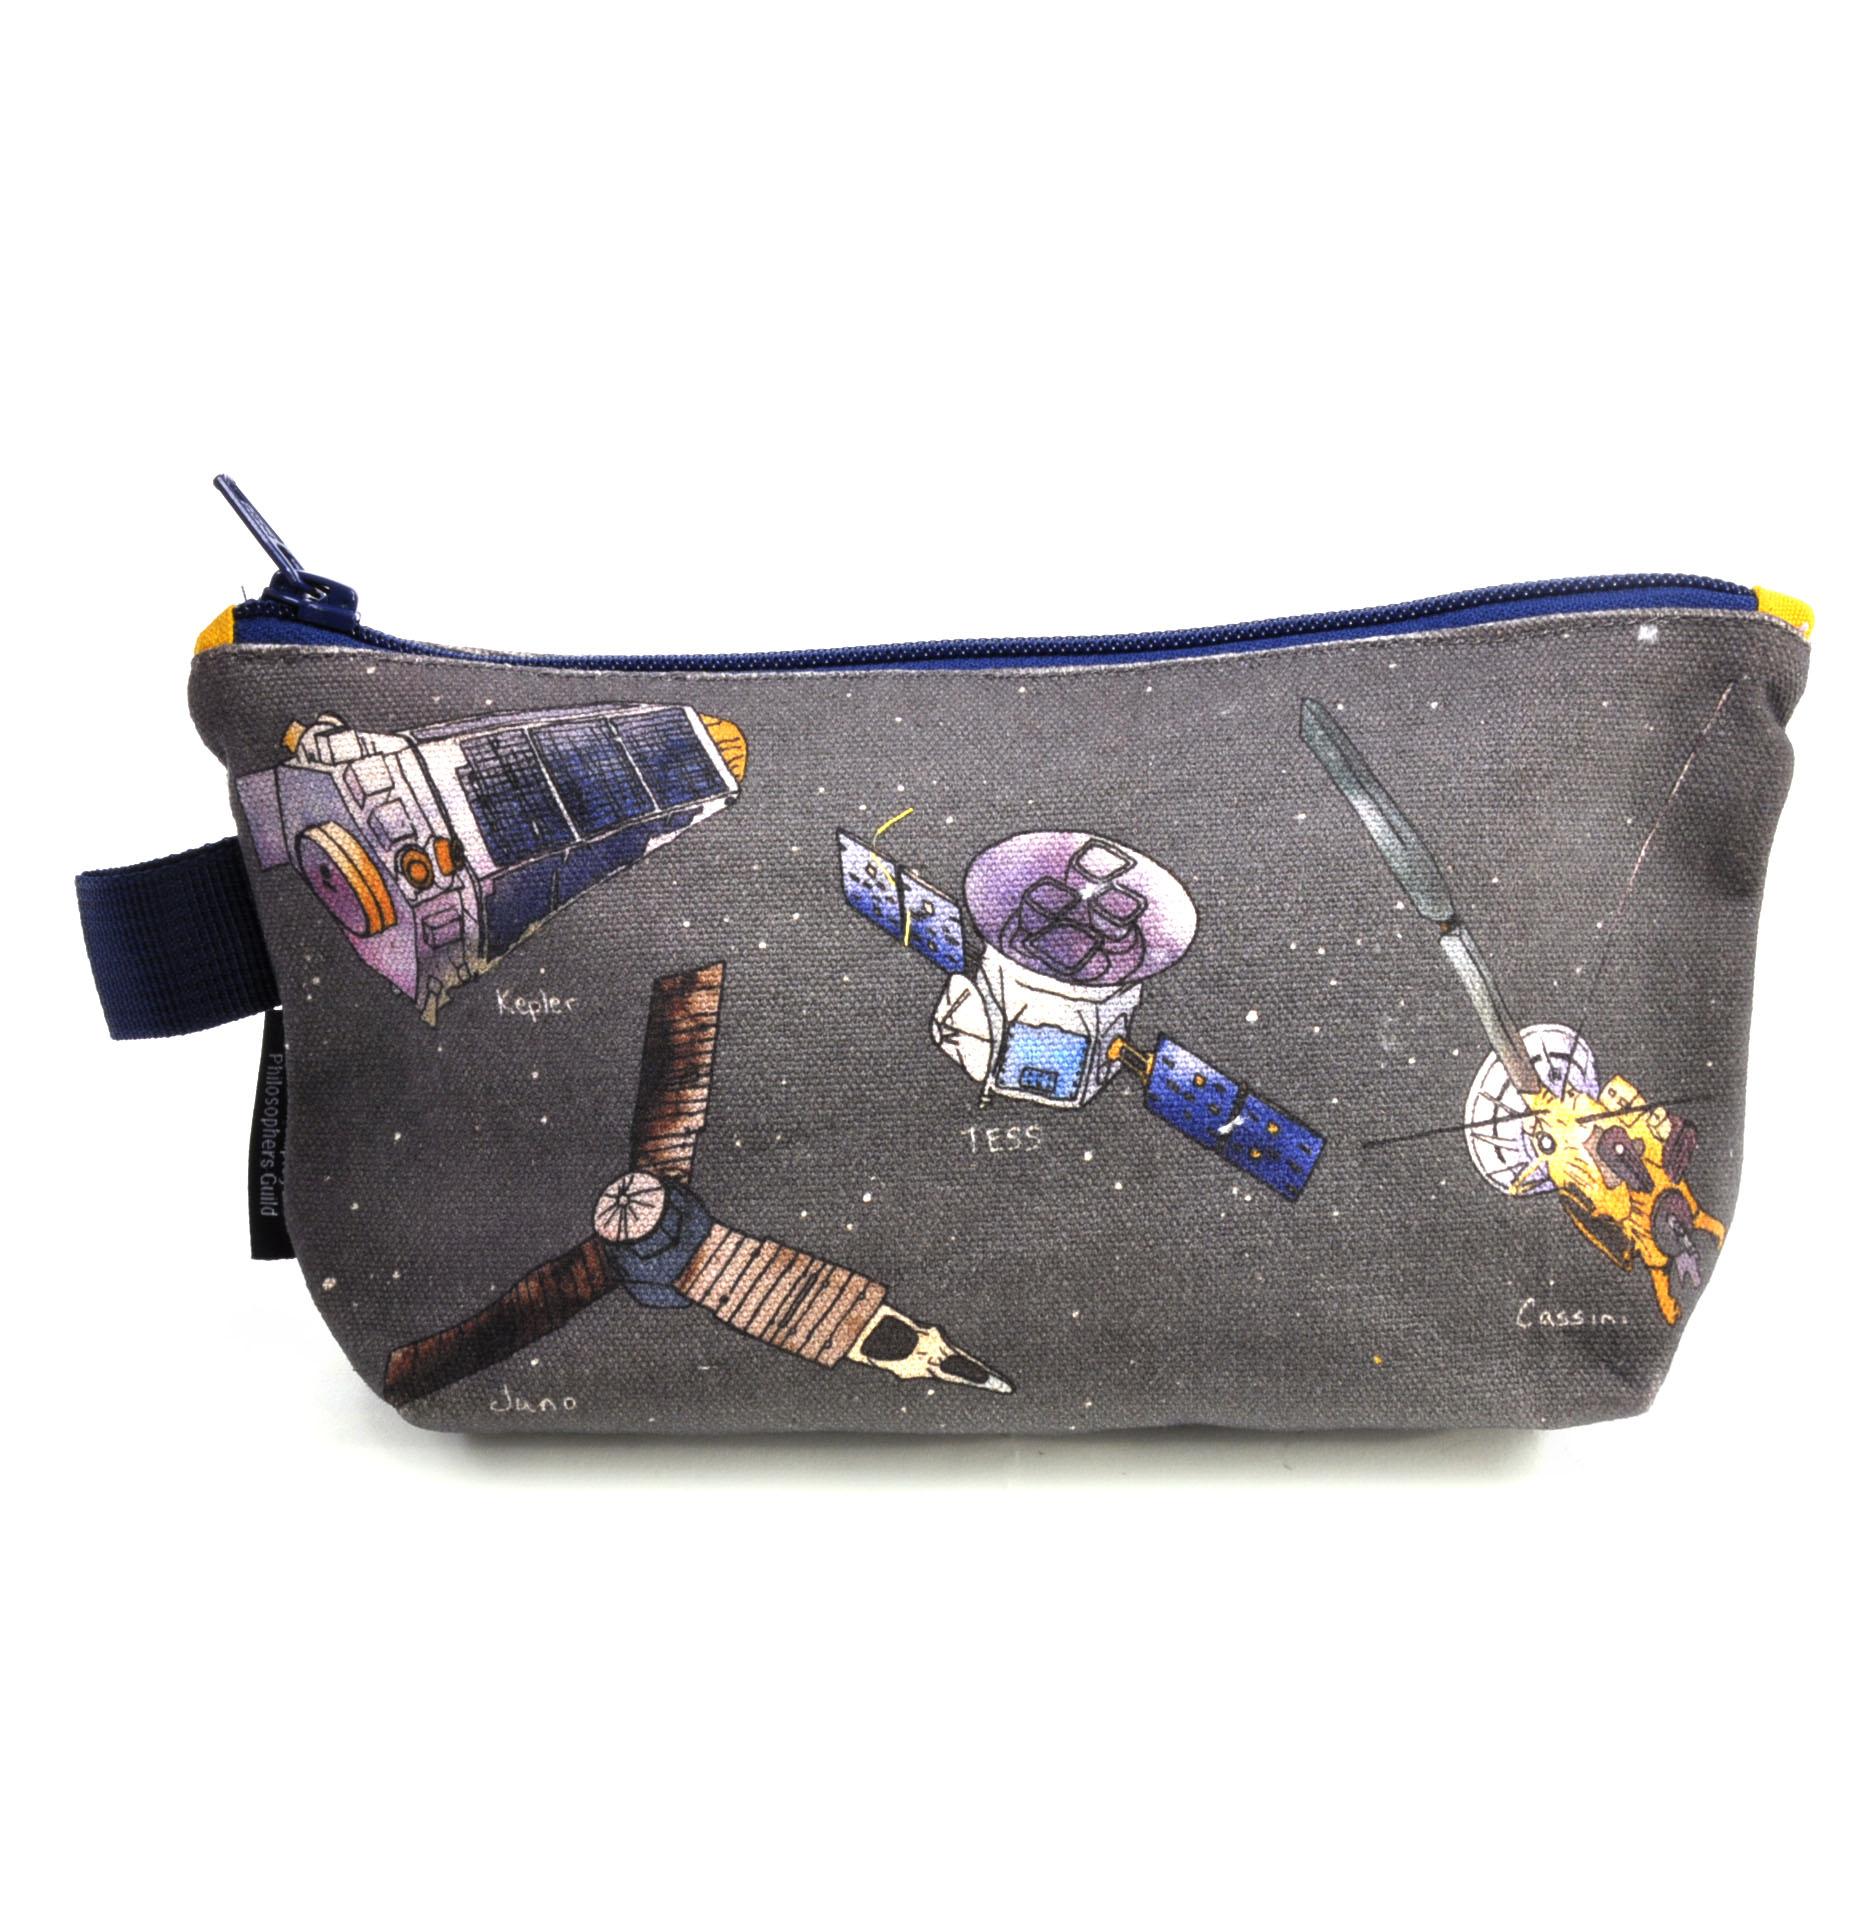 Space Flight Bag Pencil Case/ Cosmetics & Make Up Case